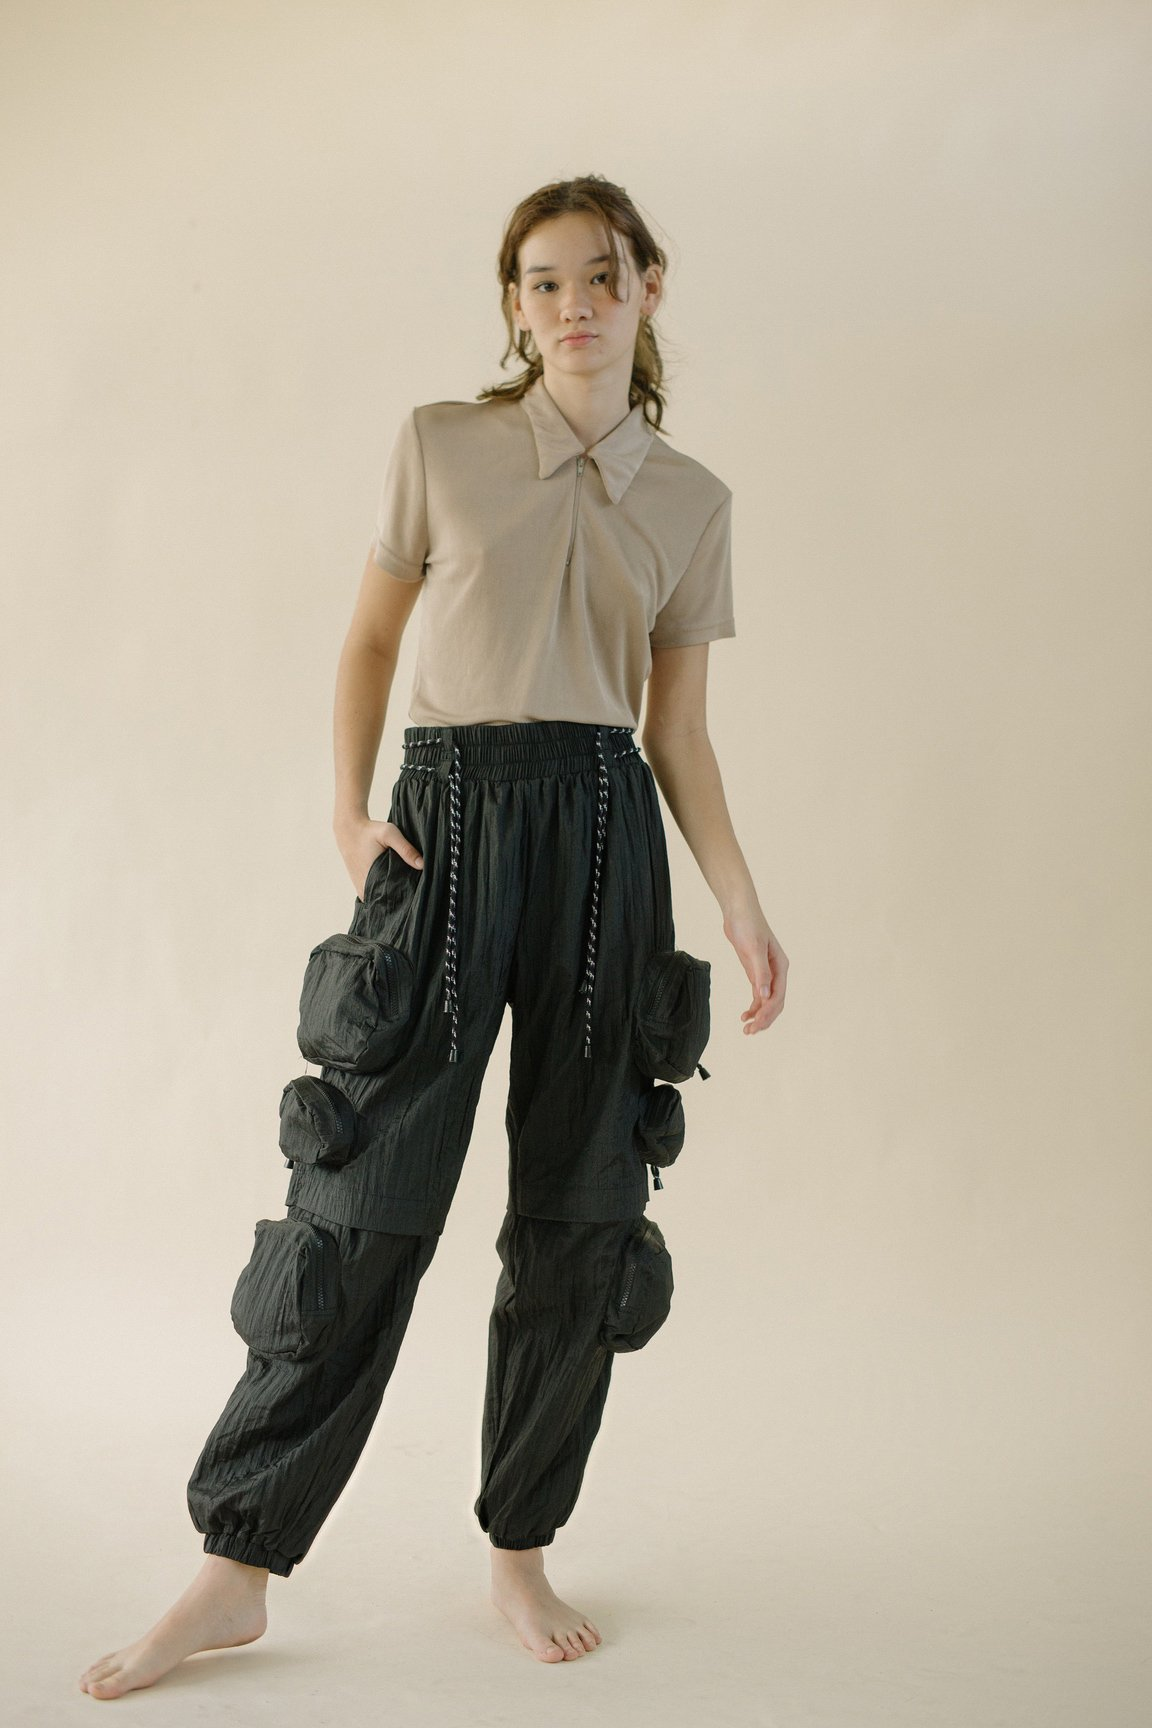 #PopbelaOOTD: Celana Panjang Hitam yang Harus Ada di Lemarimu